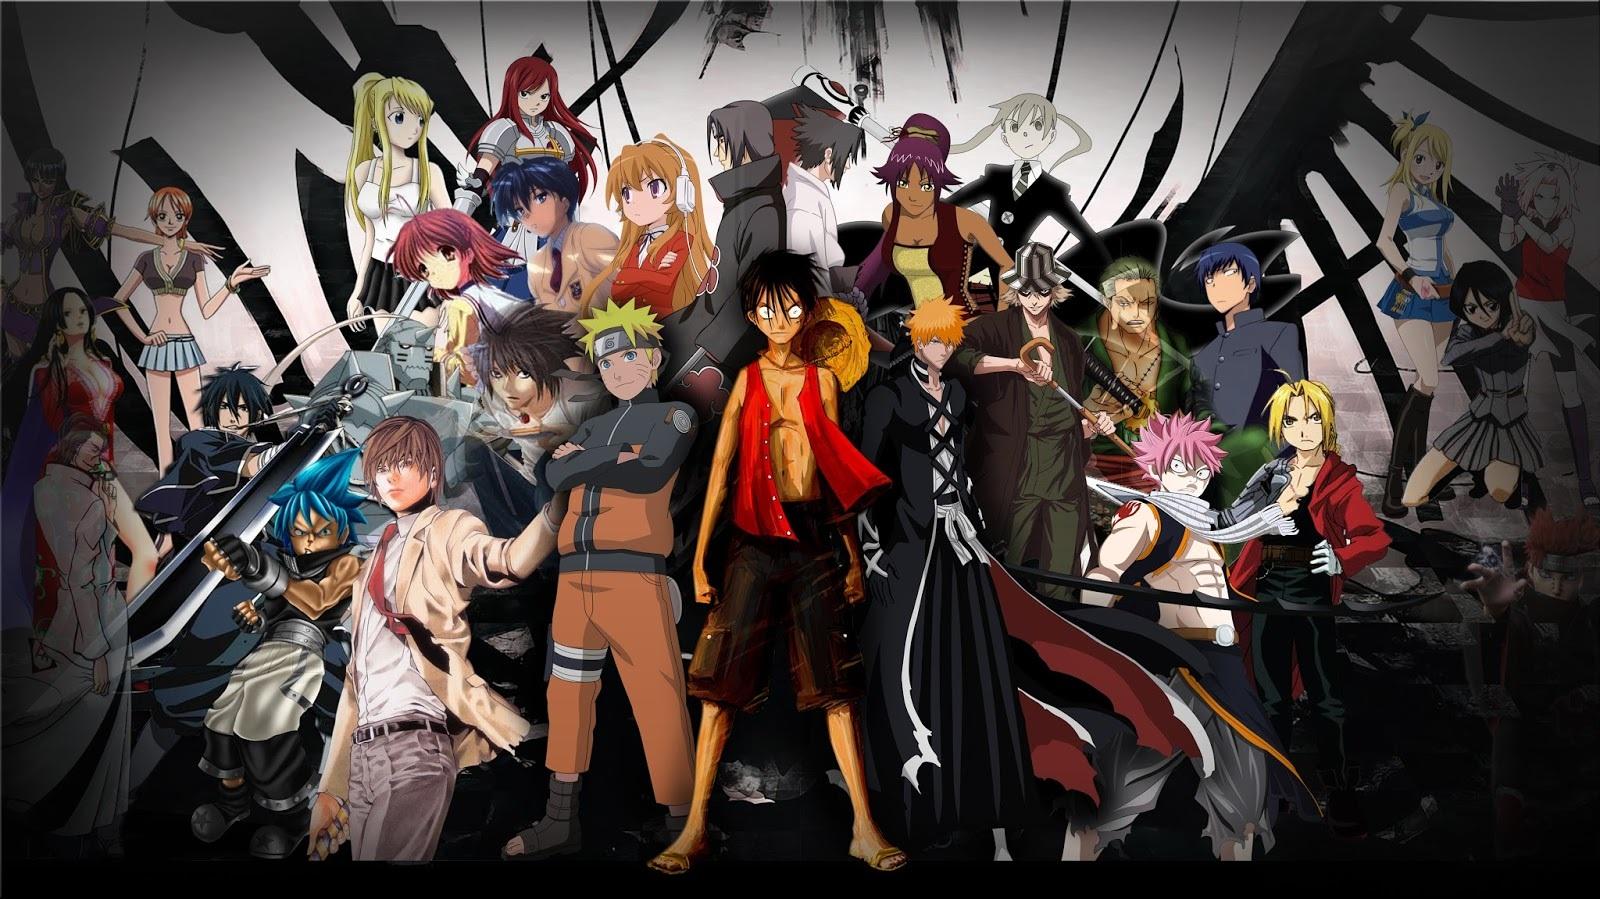 Daftar Anime Yang Akan Rilis 2018